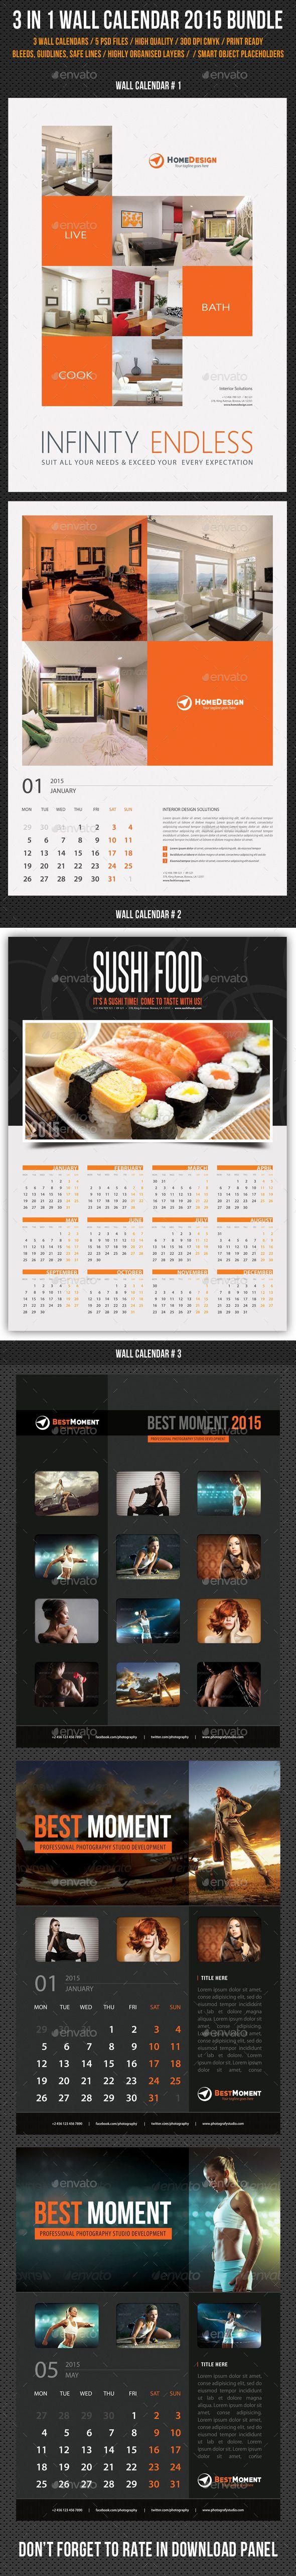 3 in 1 Wall Calendar 2015 Bundle Template | Buy and Download: http://graphicriver.net/item/3-in-1-wall-calendar-2015-bundle-v06/9573448?ref=ksioks